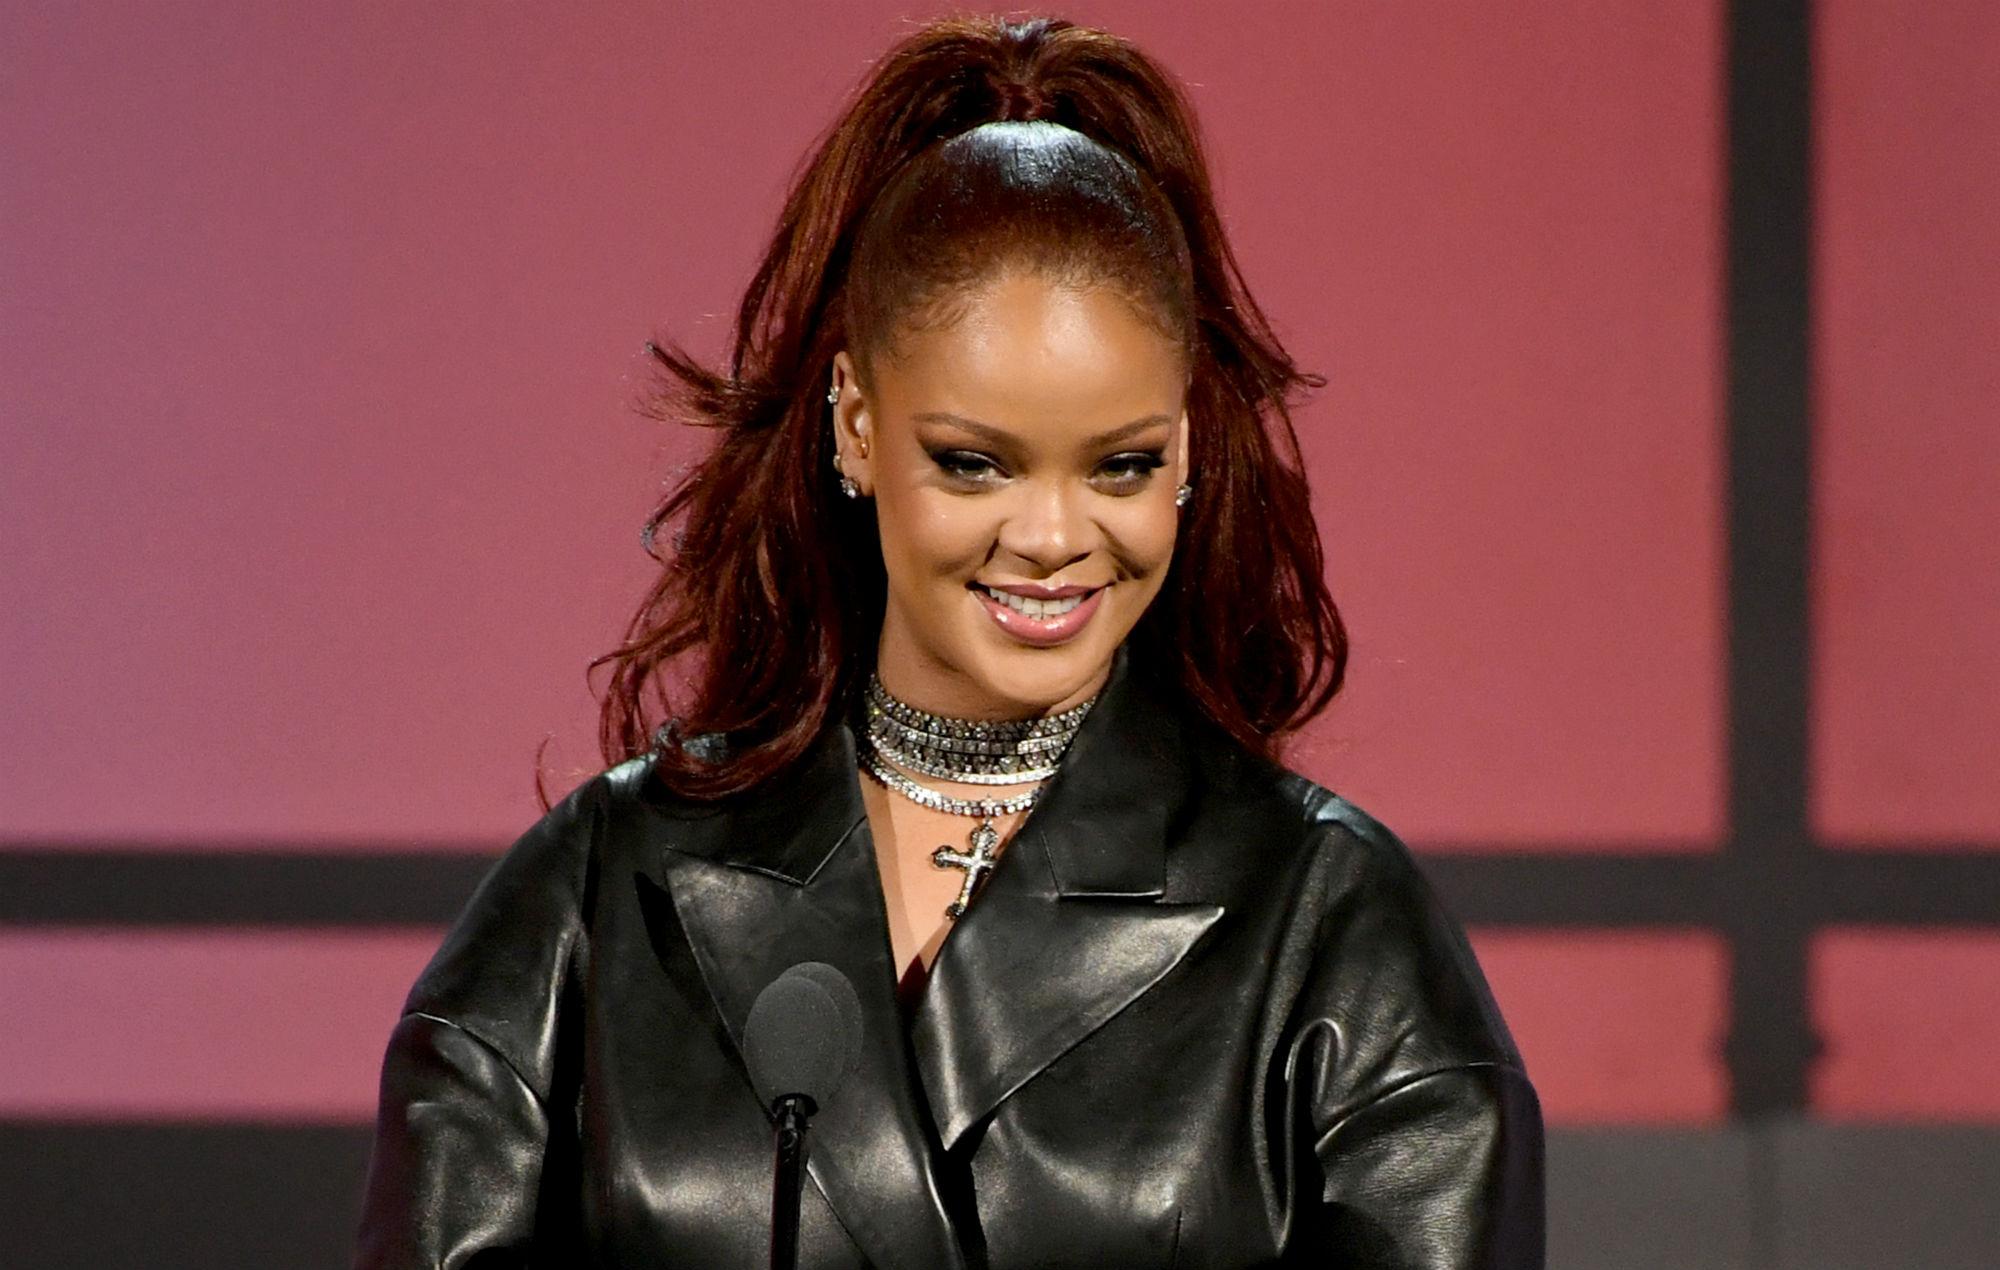 Rihanna is still working on a new reggae album